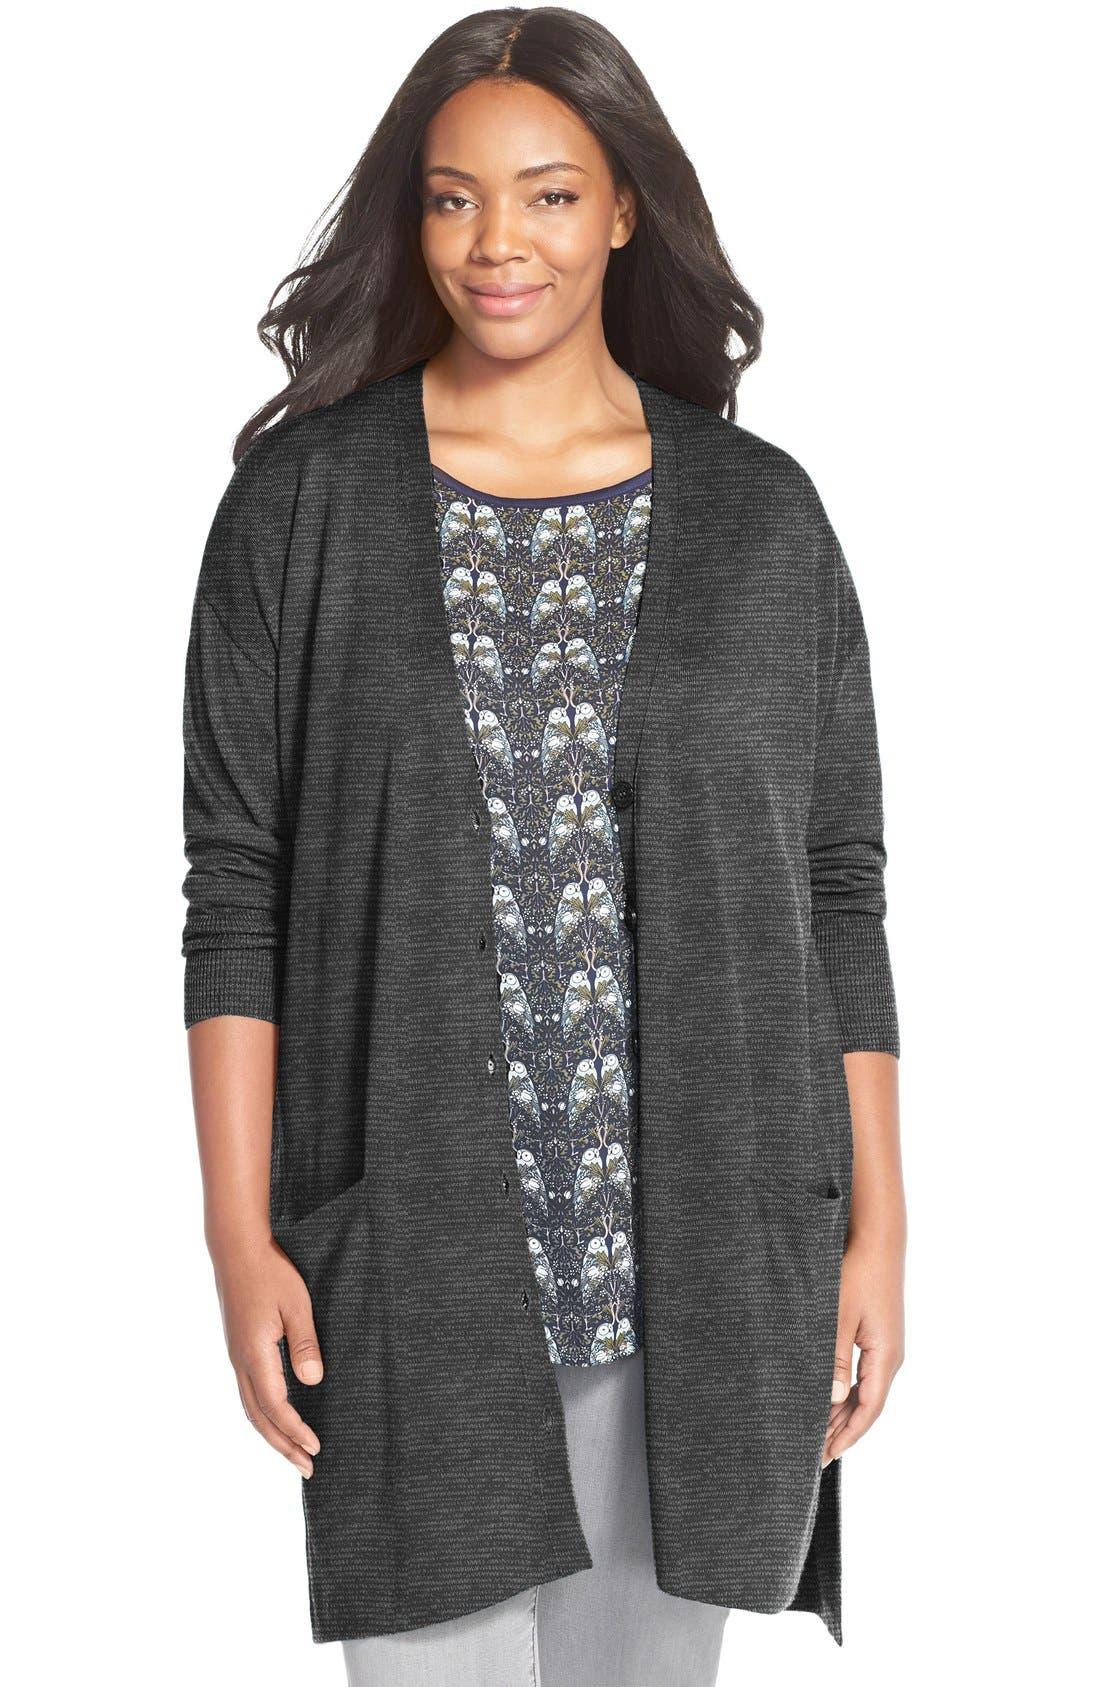 Alternate Image 1 Selected - Sejour 'Core' Wool Blend V-Neck Cardigan (Plus Size)